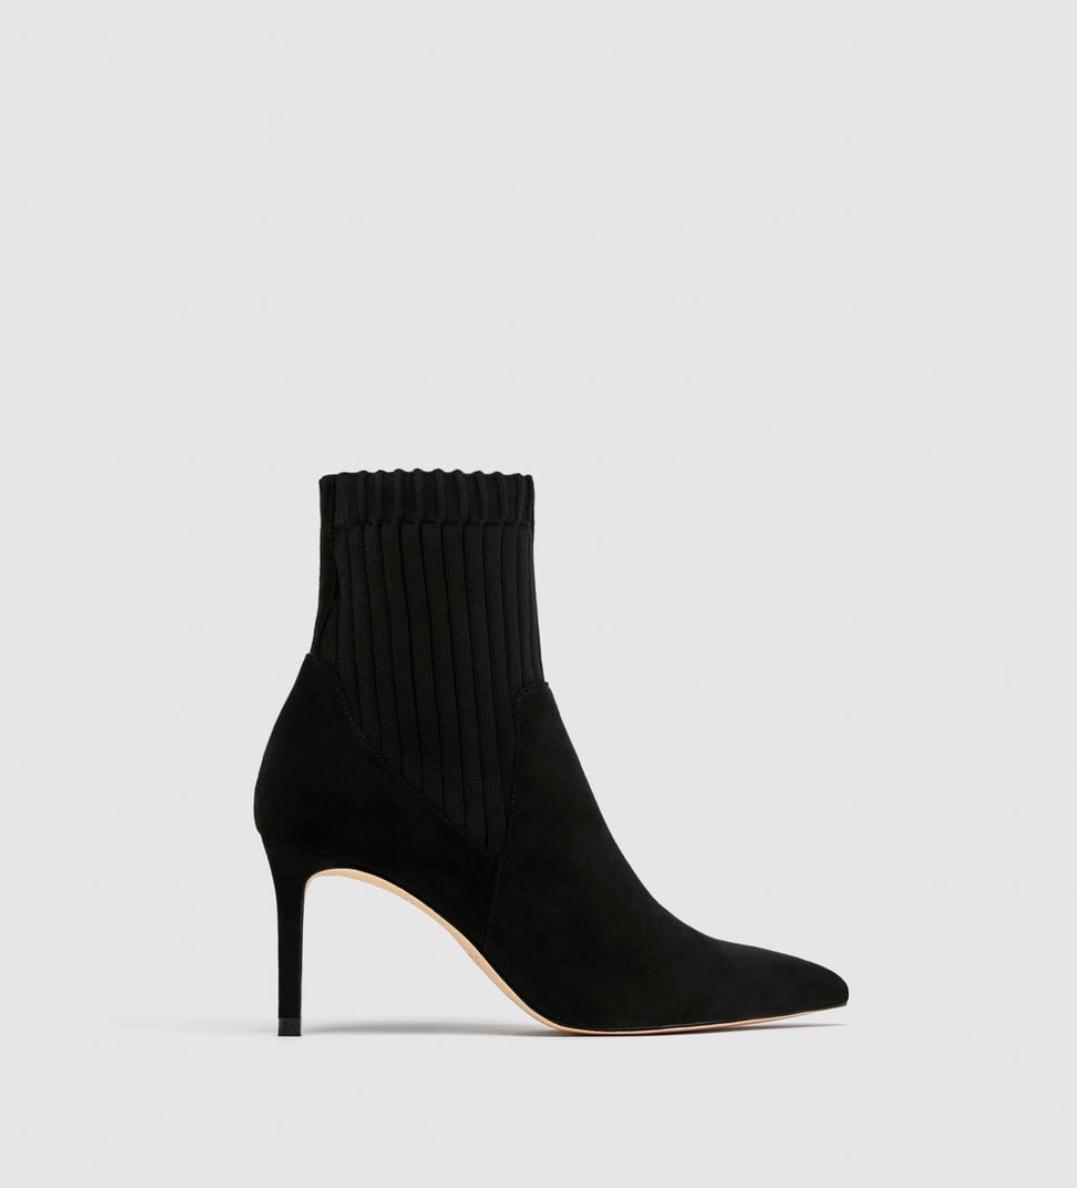 Sarita loves - Zara Contrasting Sock Style High Heel Boot$99.00